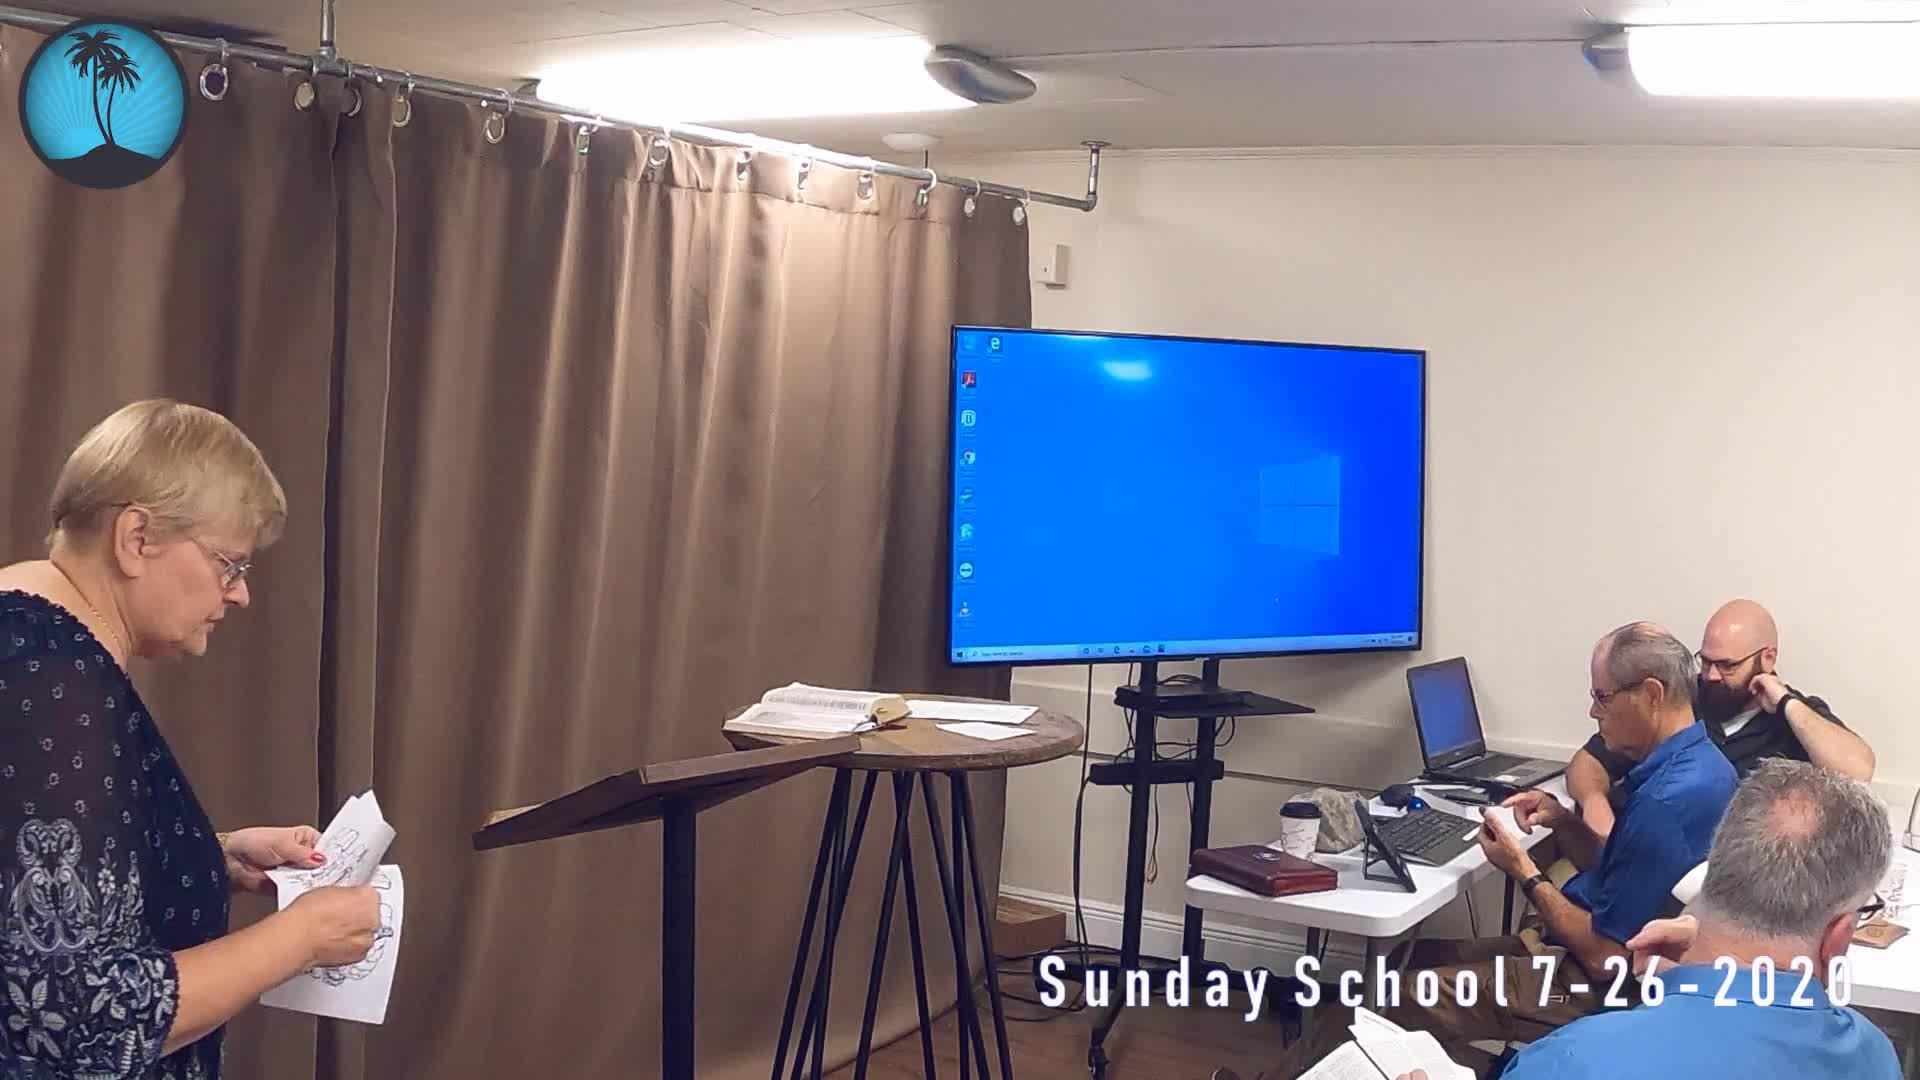 Sunday School 1st Service